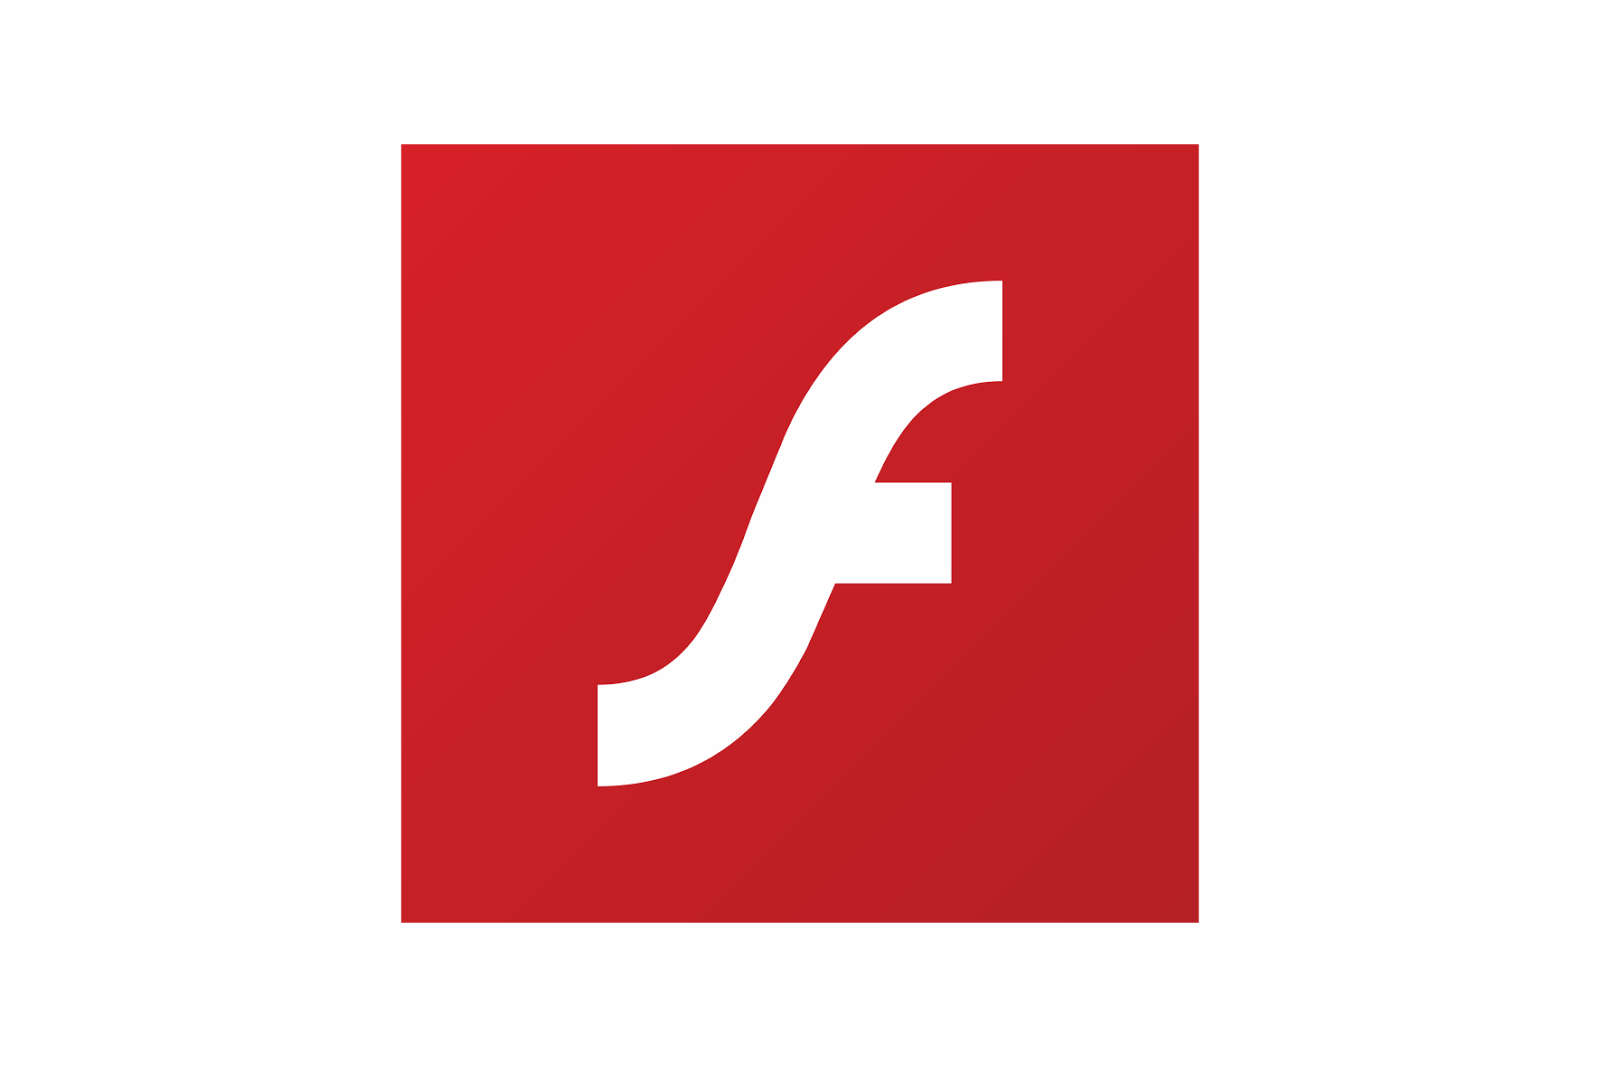 adobe flash player, adobe flash player greenhatfiles, adobe flash player   greenhatfiles